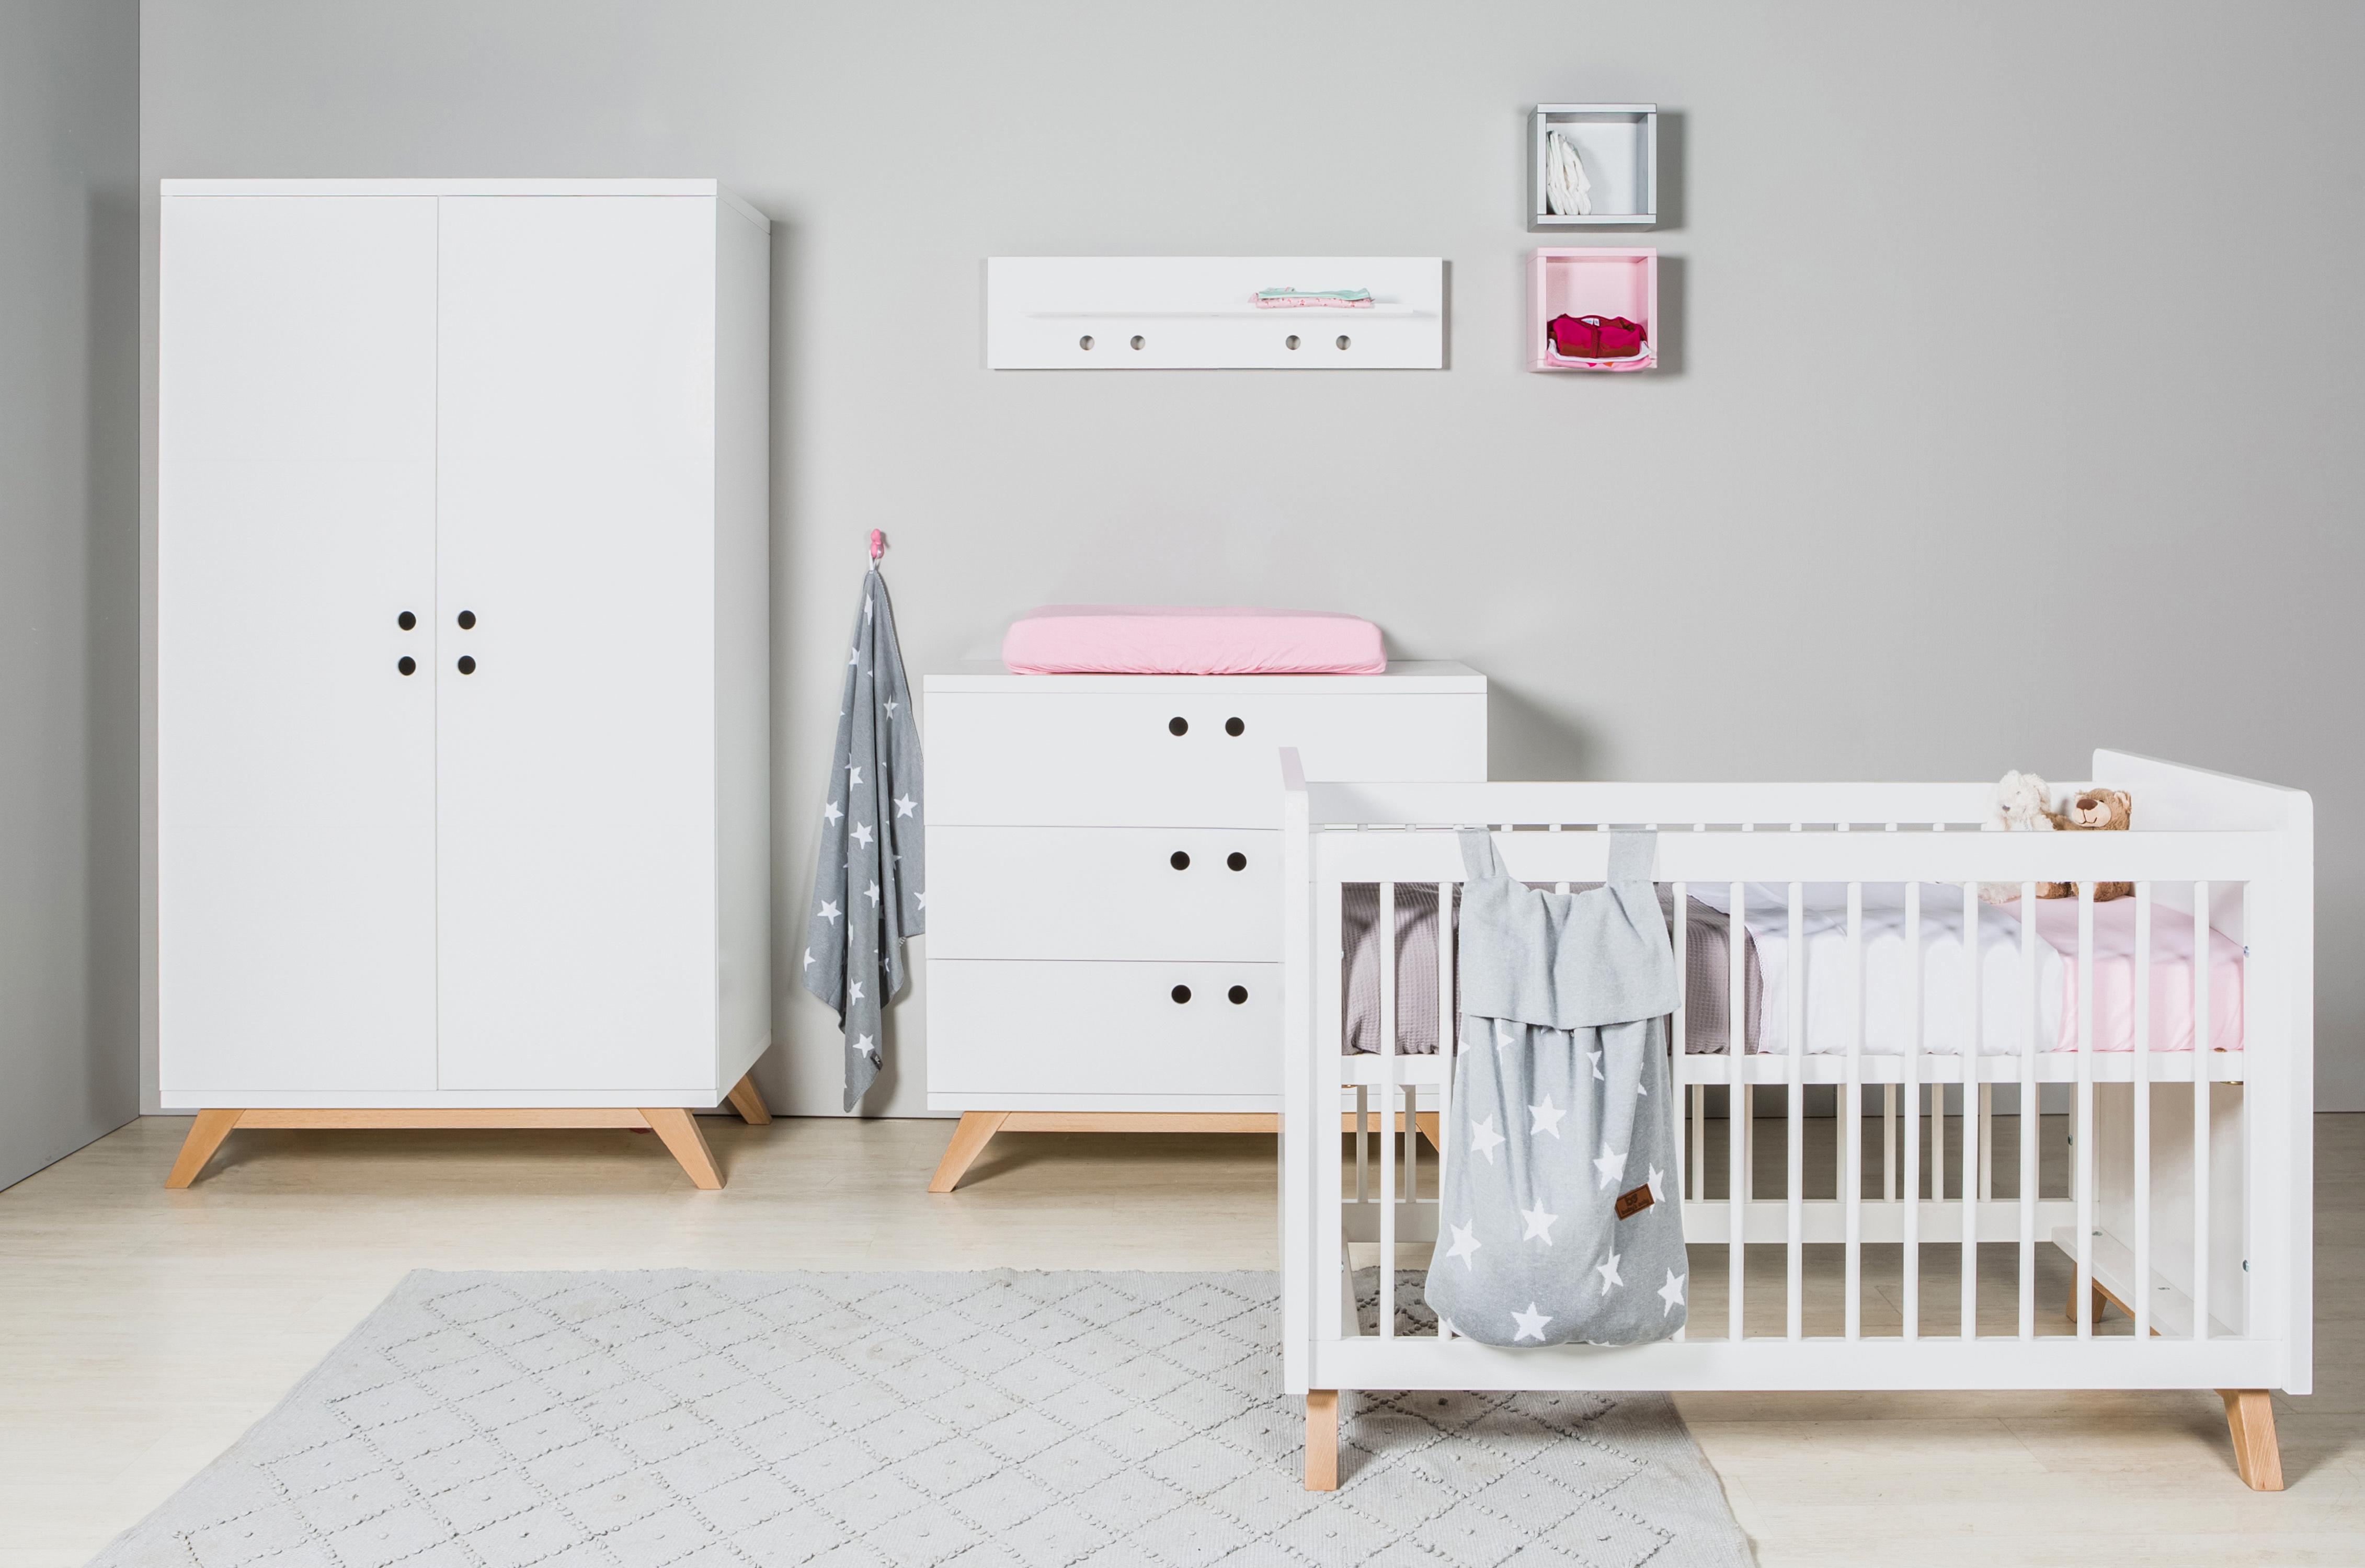 Chambre b b trendy b22ly1 meubelen joremeubelen jore - Destockage chambre bebe ...